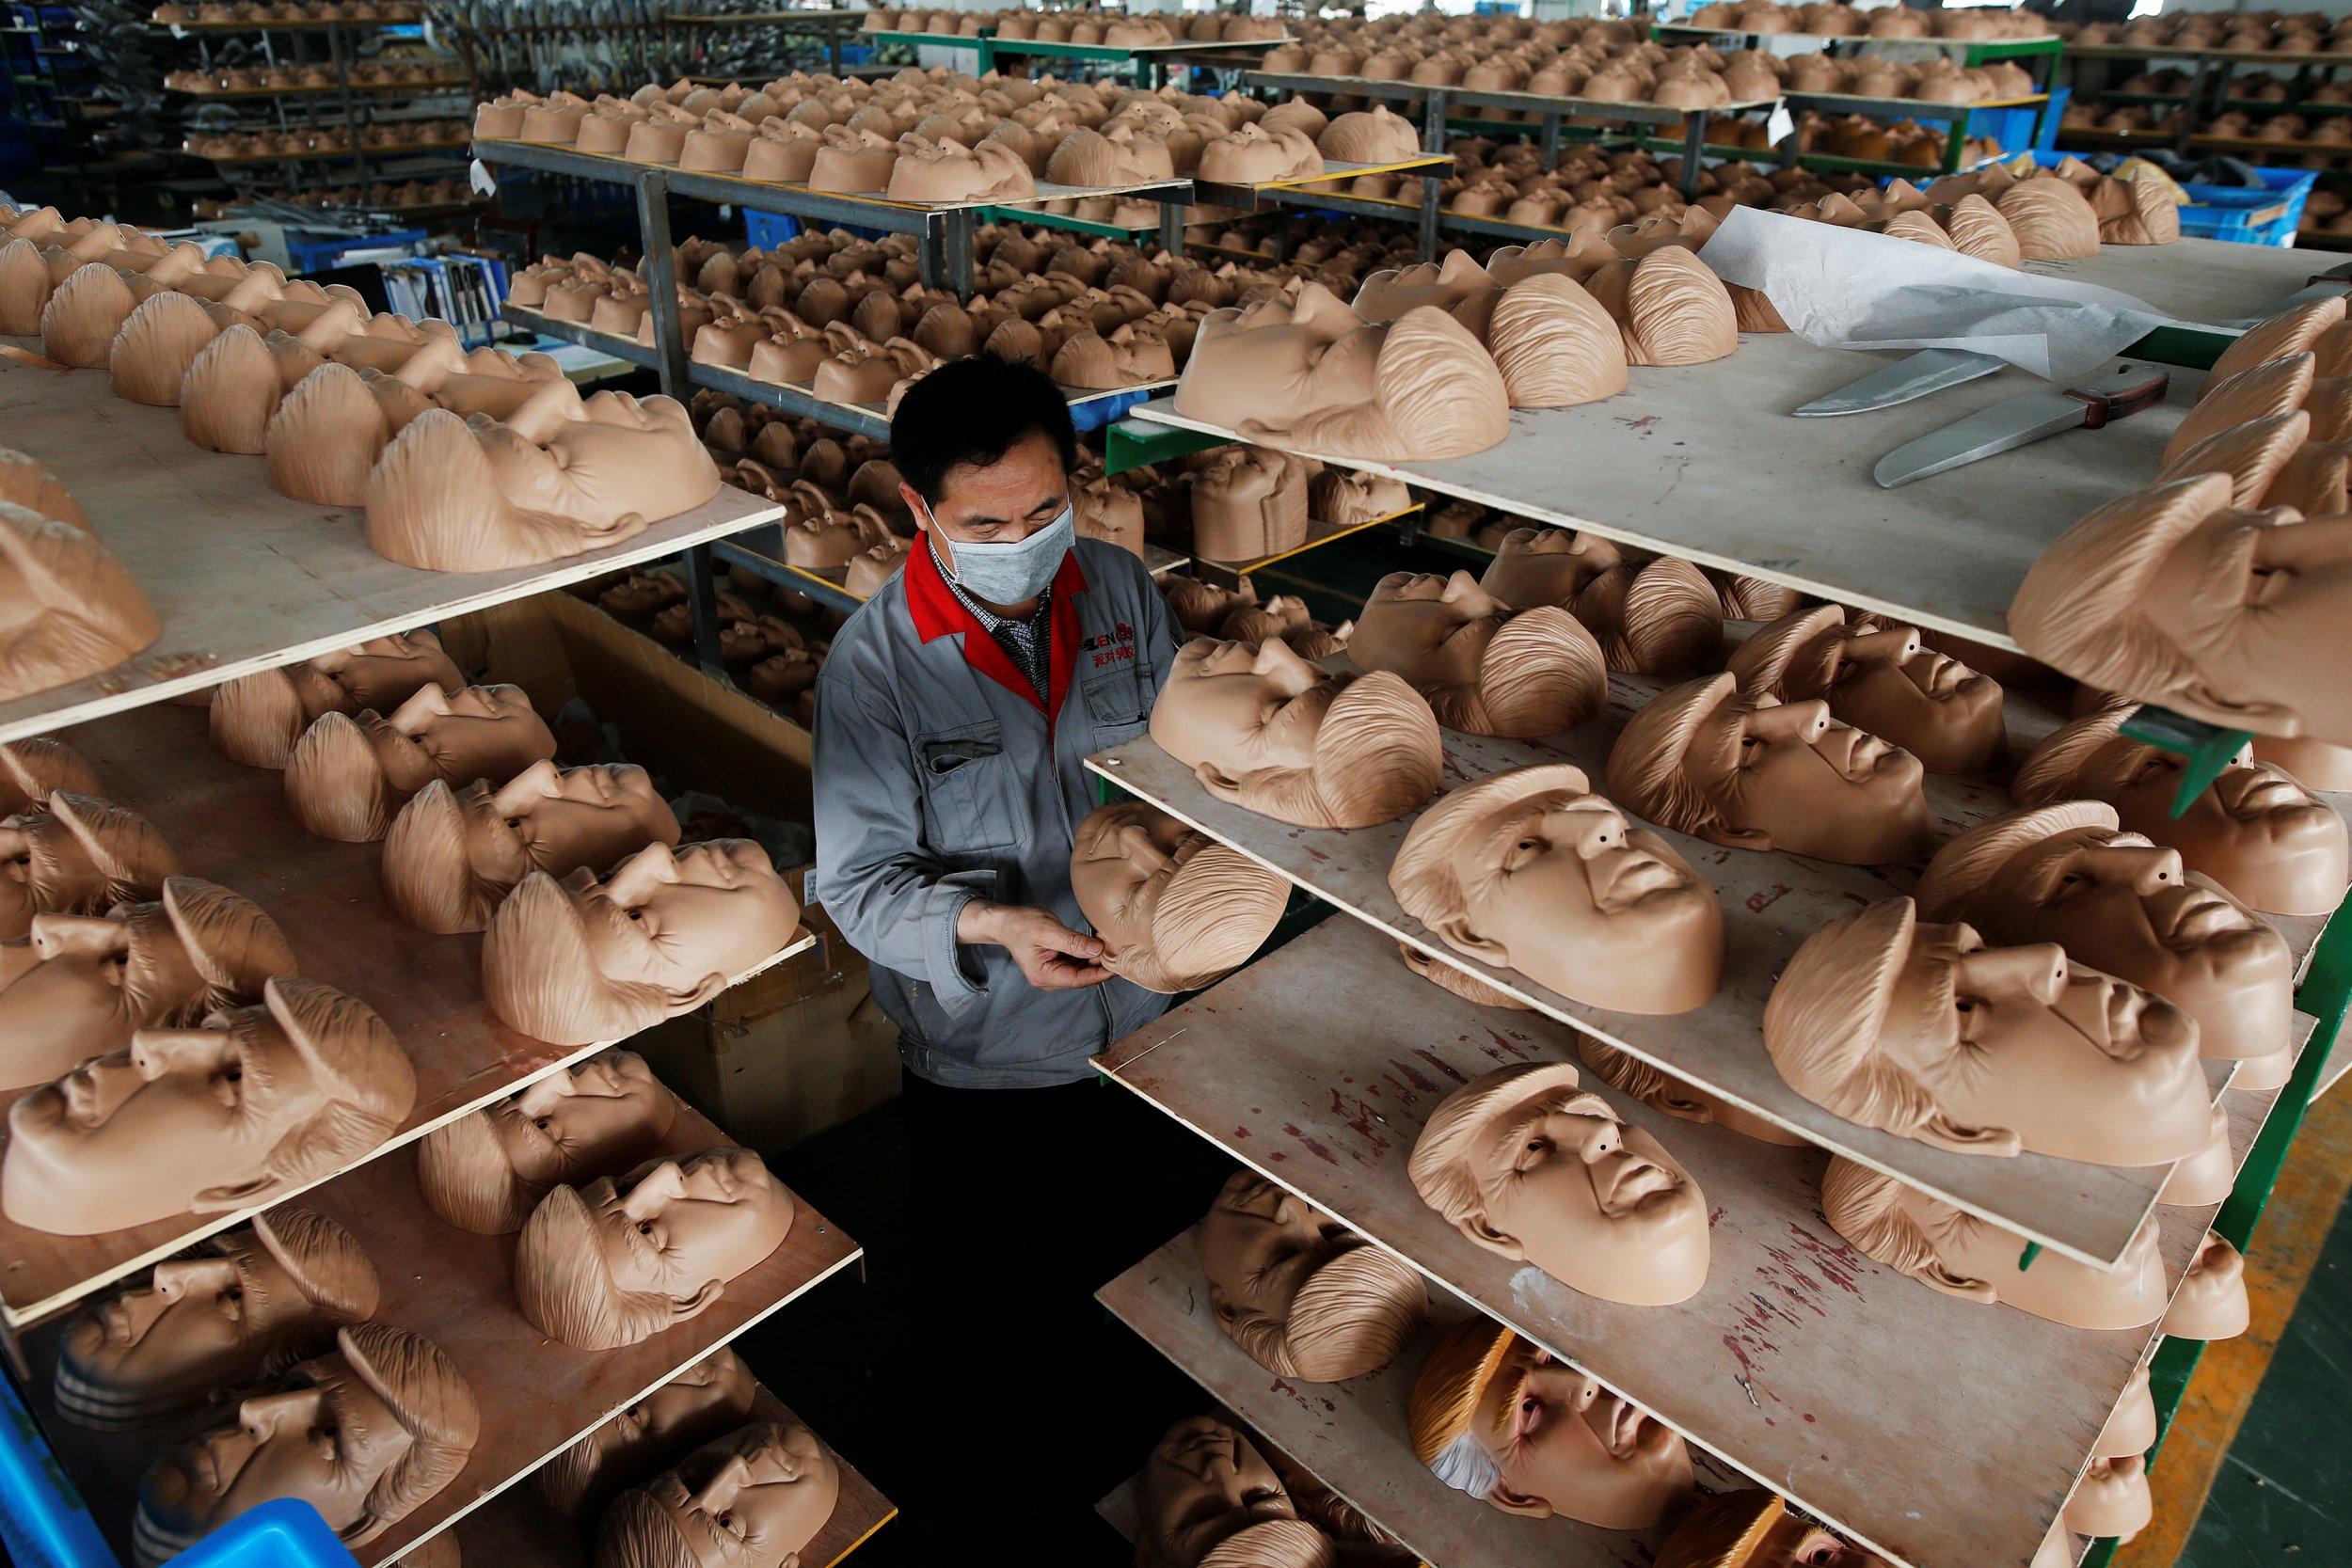 Donald Trump masks